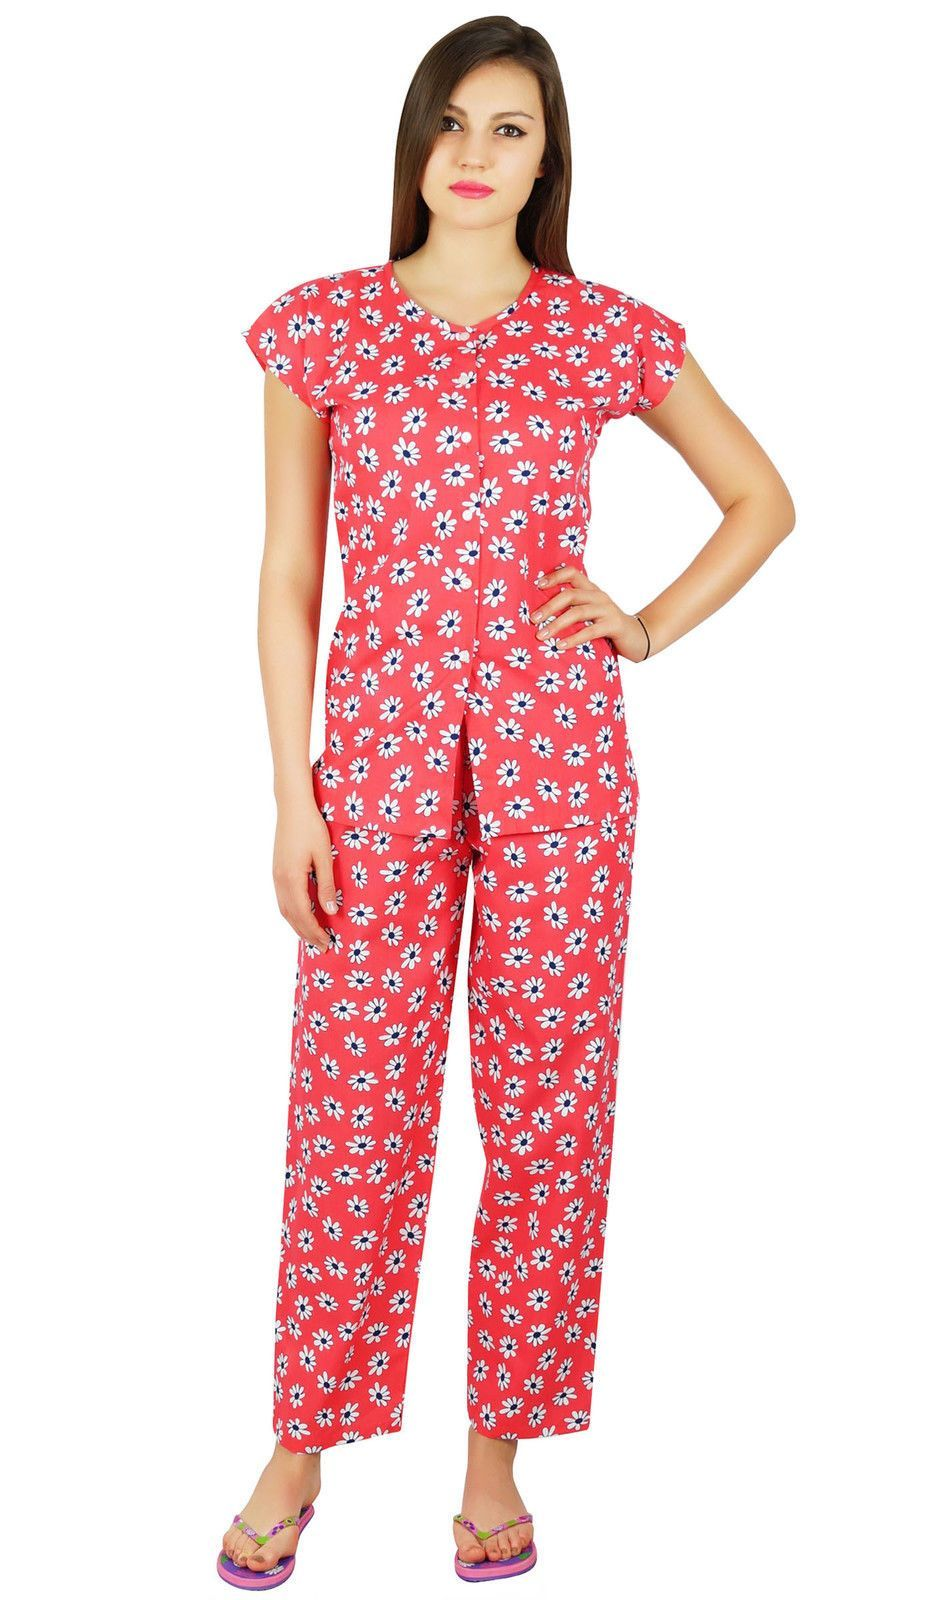 1676b6ad68 Bimba Womens Cotton Night Wear Pajama Set Short Sleeve Shirt With Pyjamas